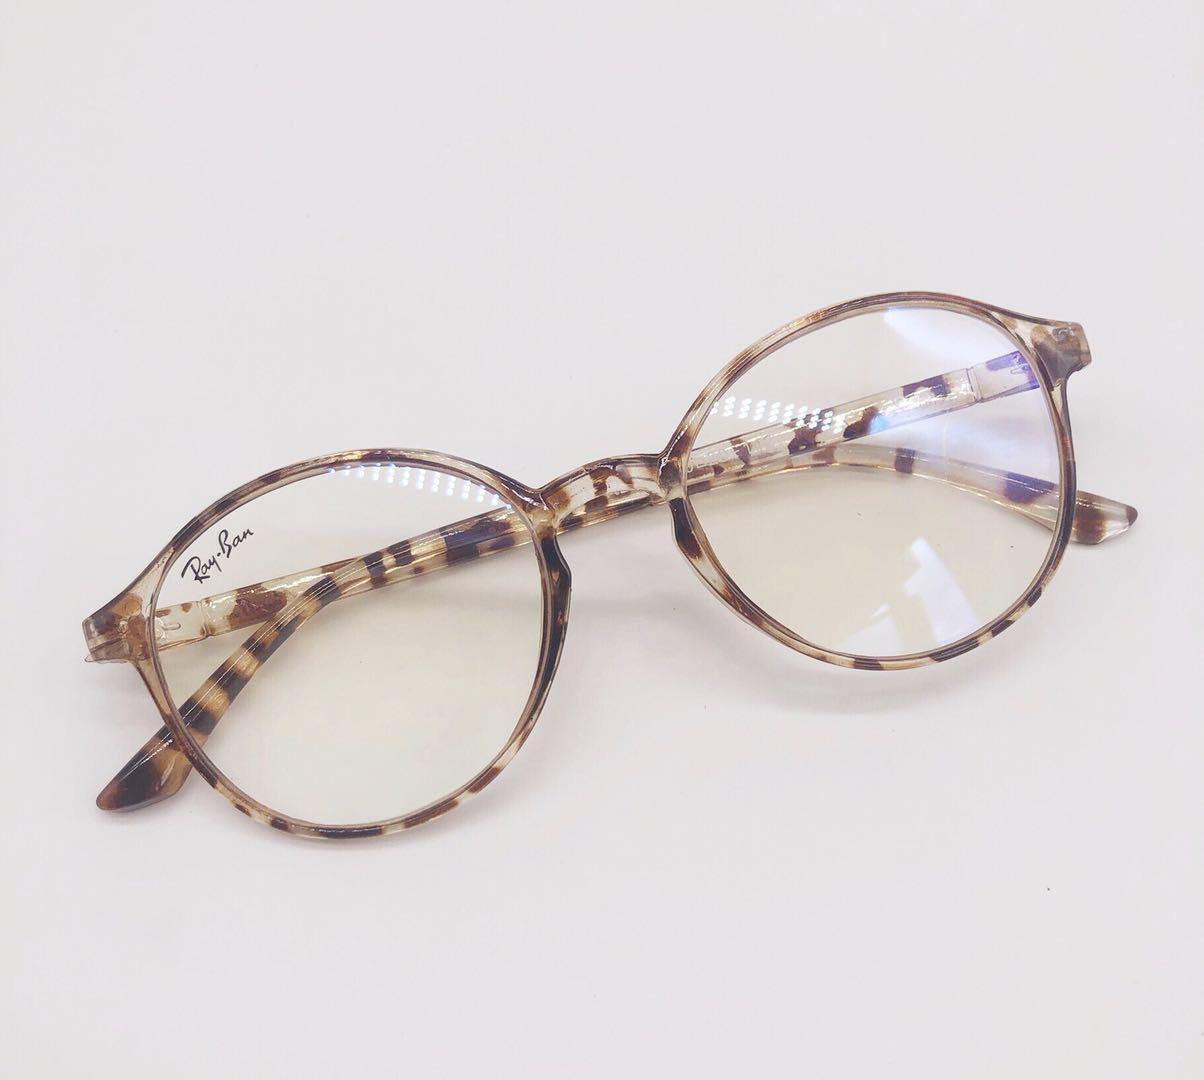 c3bdf0256c9e Sunglasses For Women for sale - Womens Sunglasses Online Deals ...